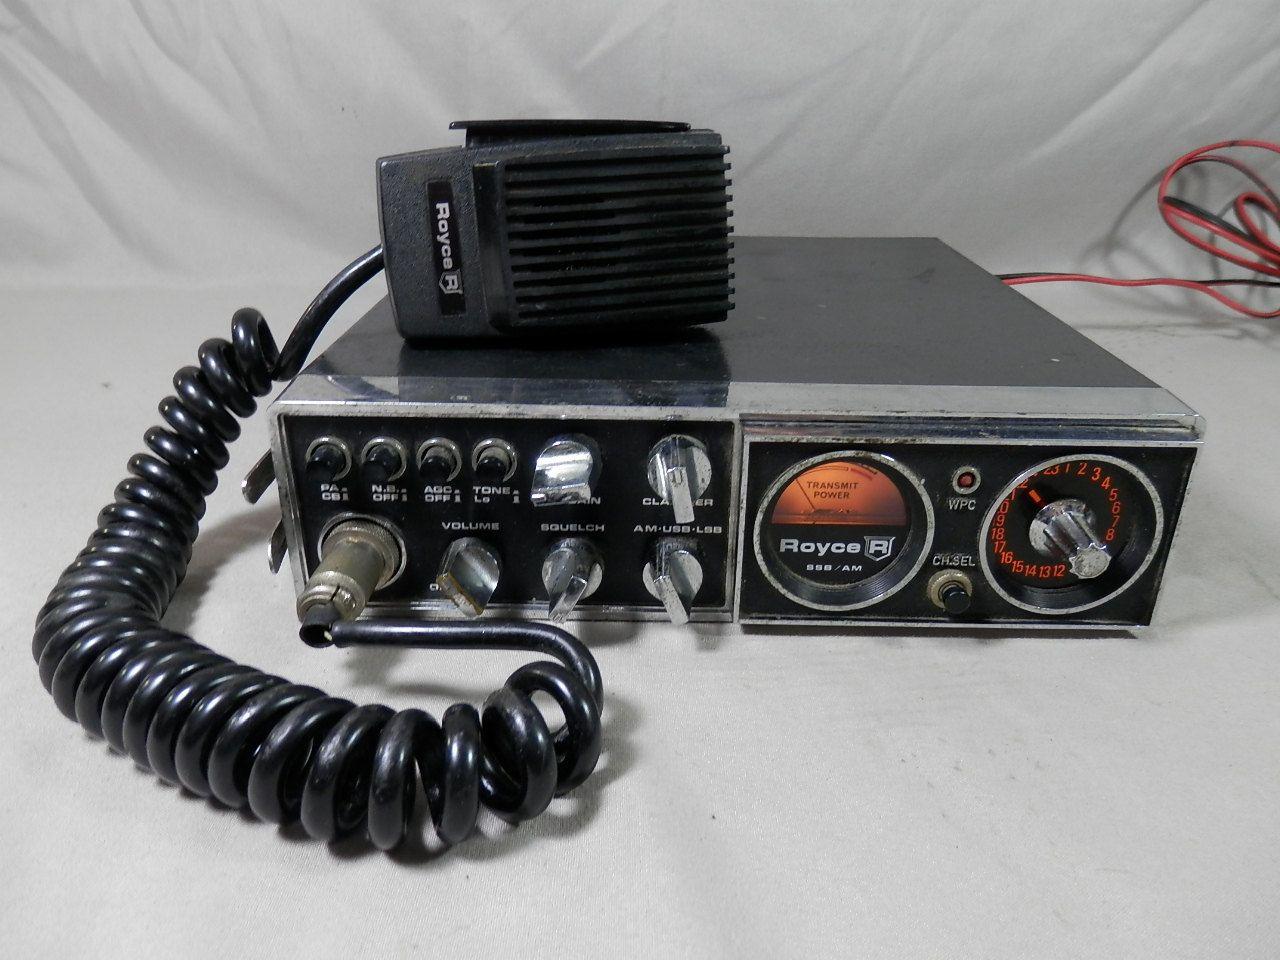 7F5FBCD Panasonic Cb Radio D104 Mic Wiring | Wiring LibraryWiring Library